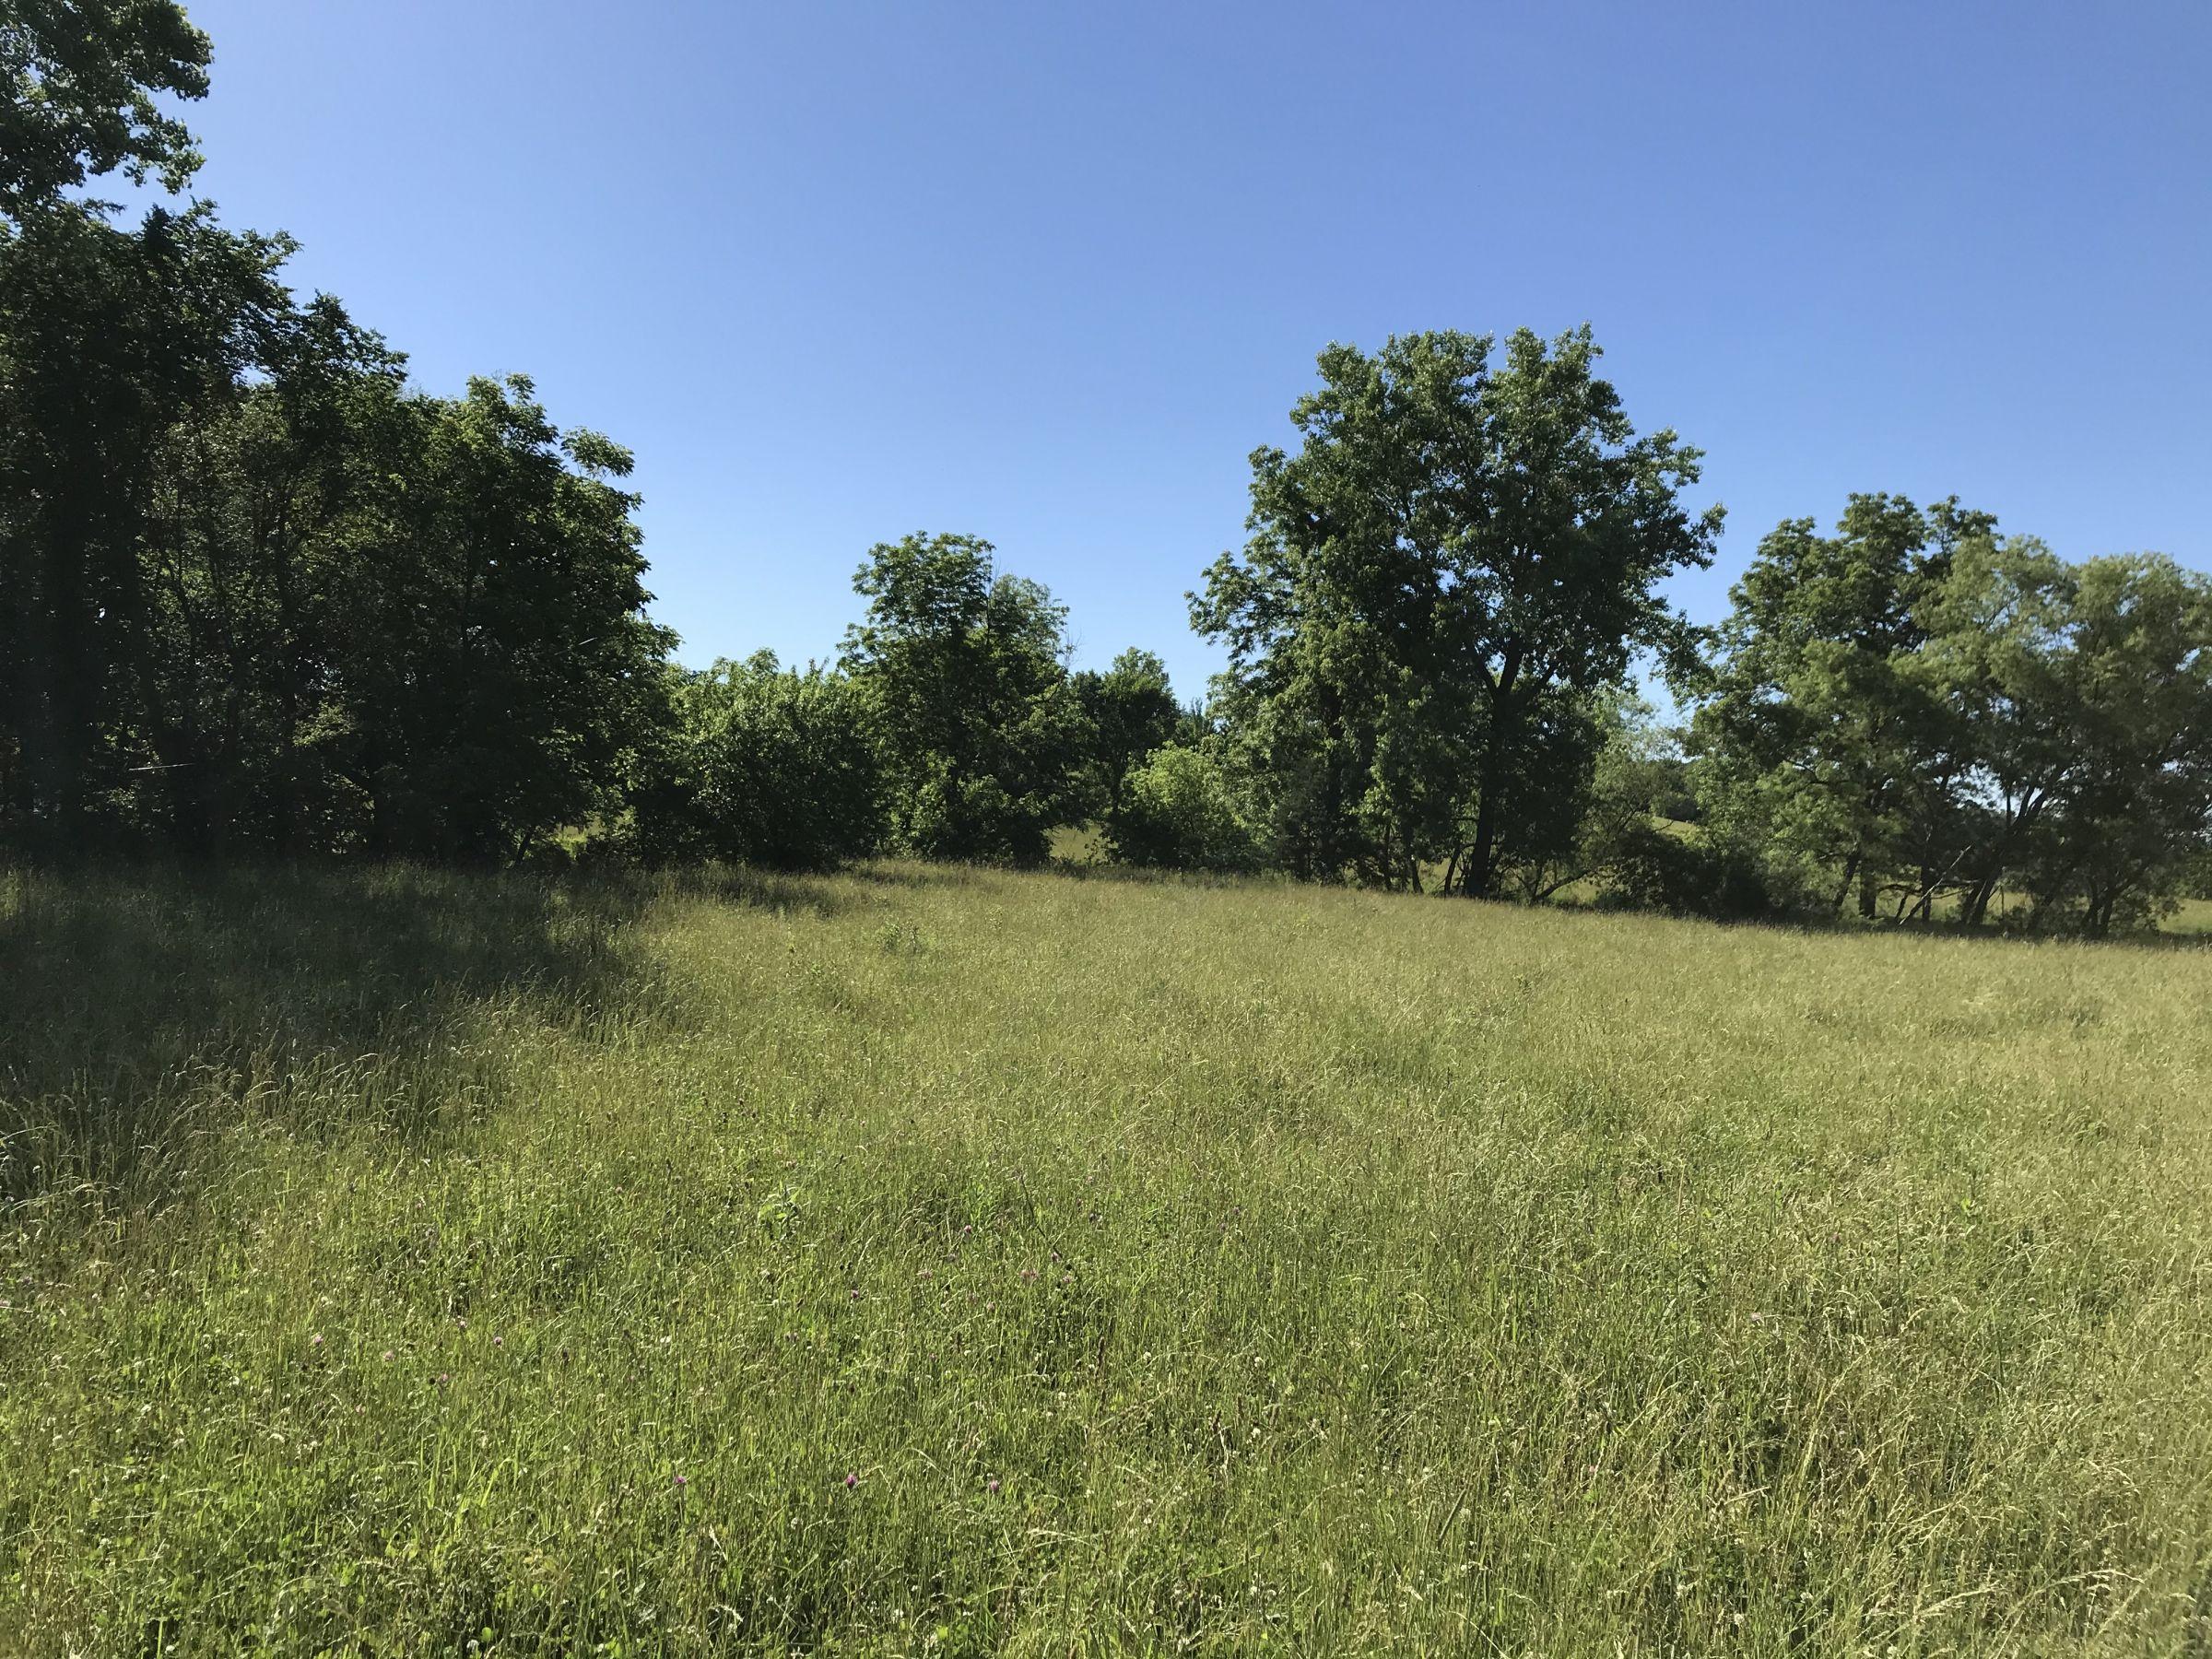 land-warren-county-iowa-60-acres-listing-number-15033-5-2020-06-14-151757.JPG